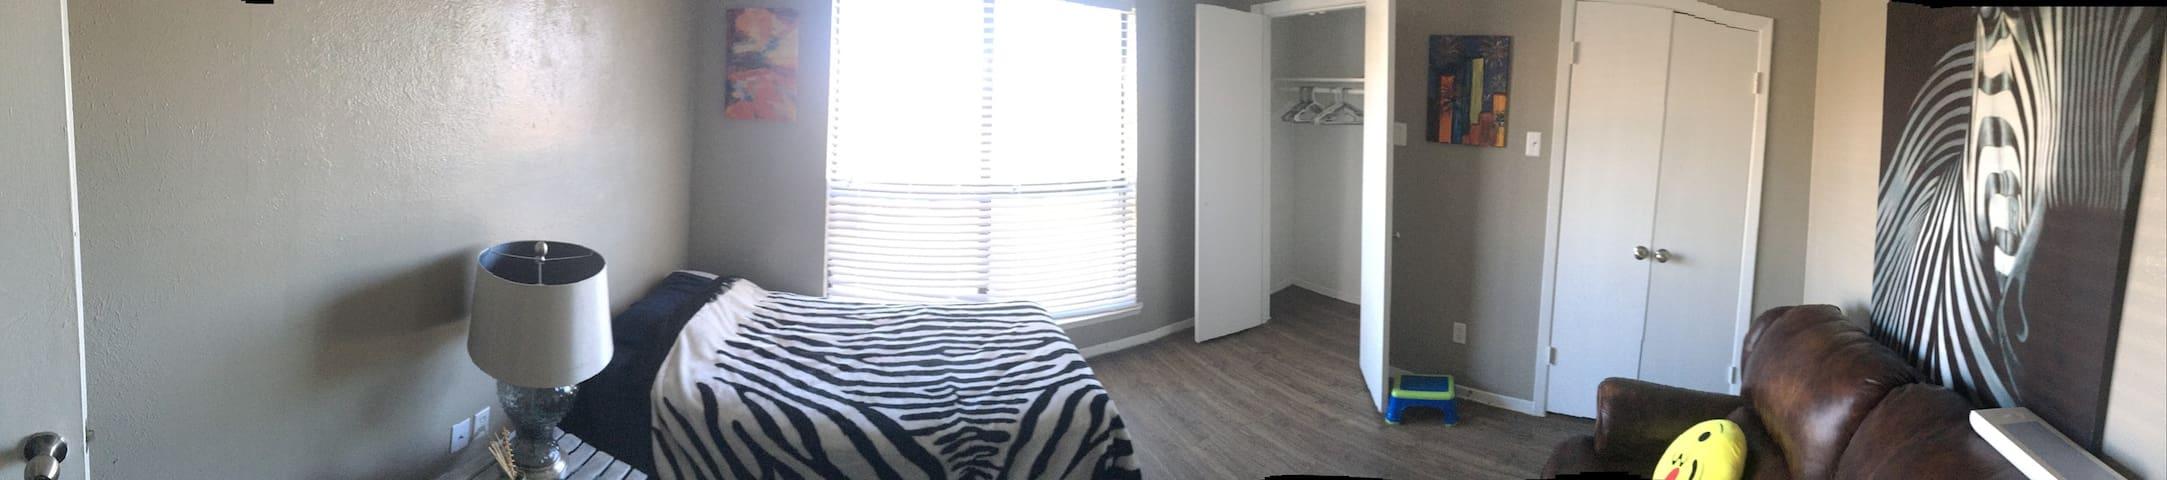 Cuarto luminoso - Irving - Apartament